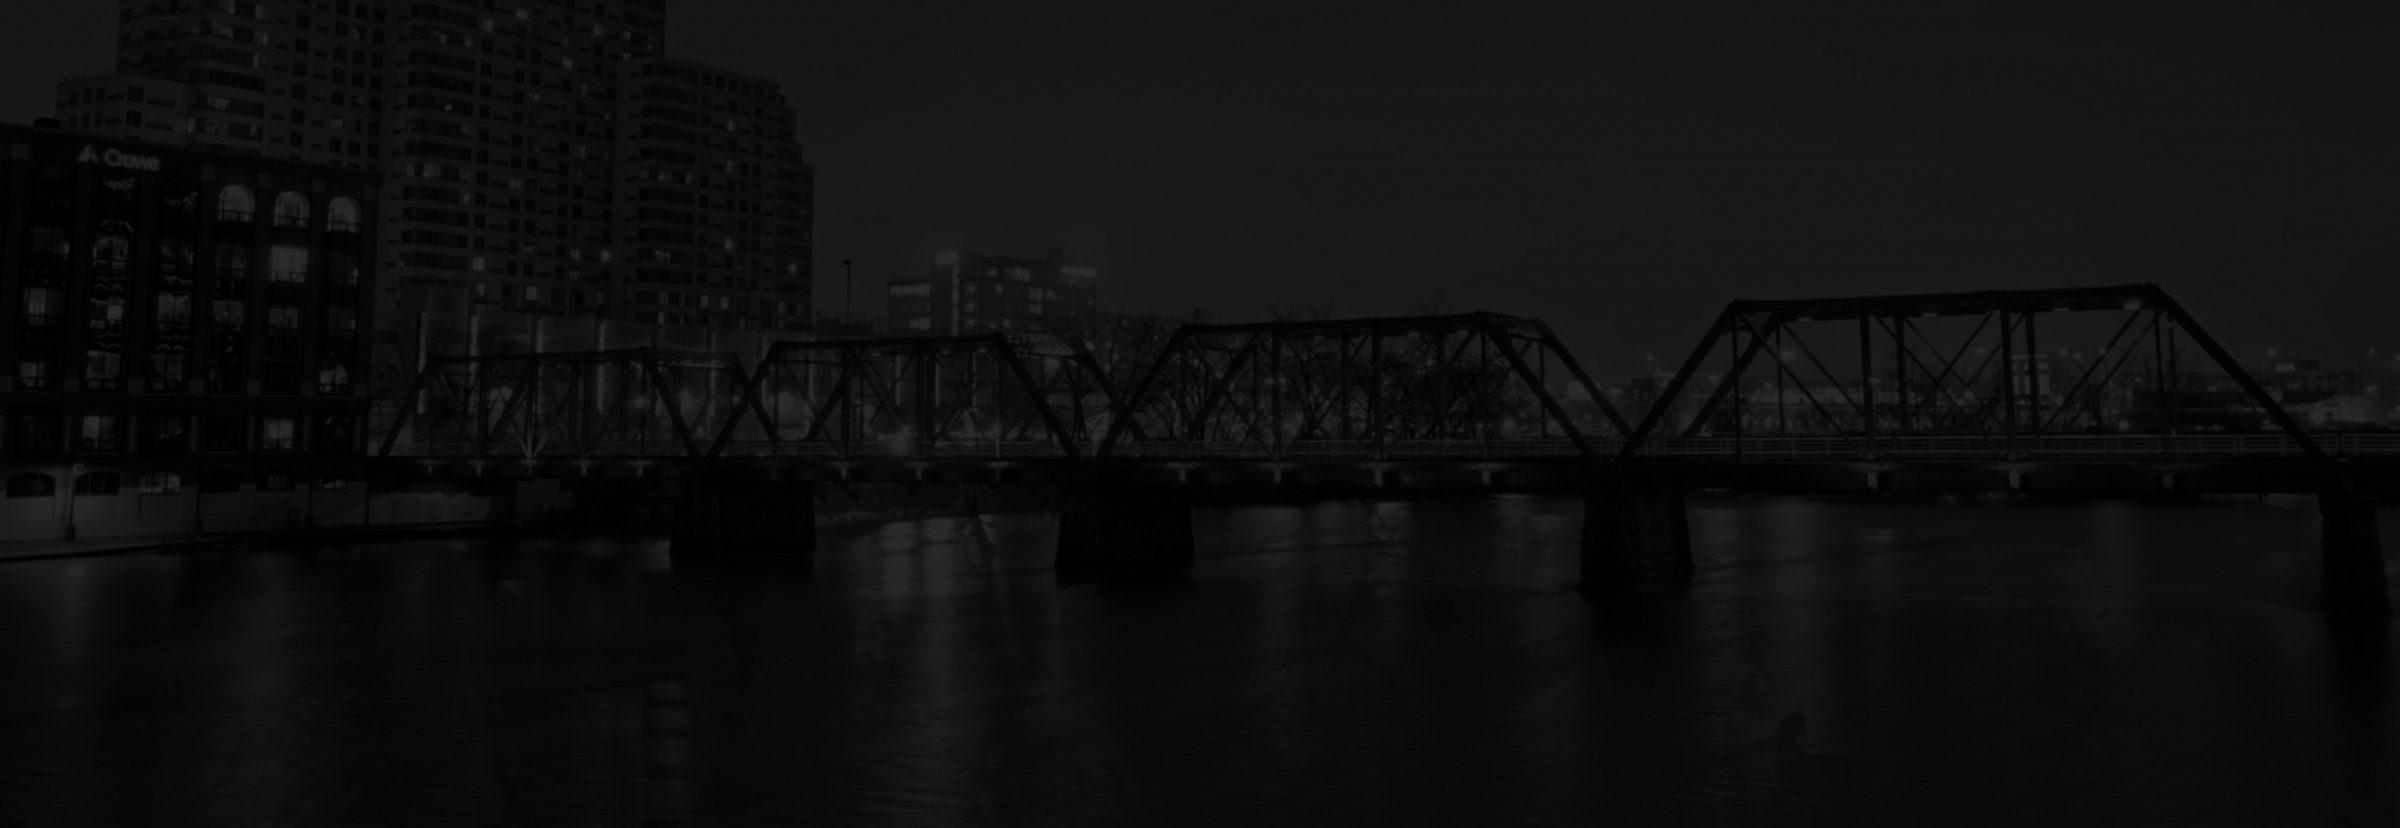 City bg dark masthead 2x